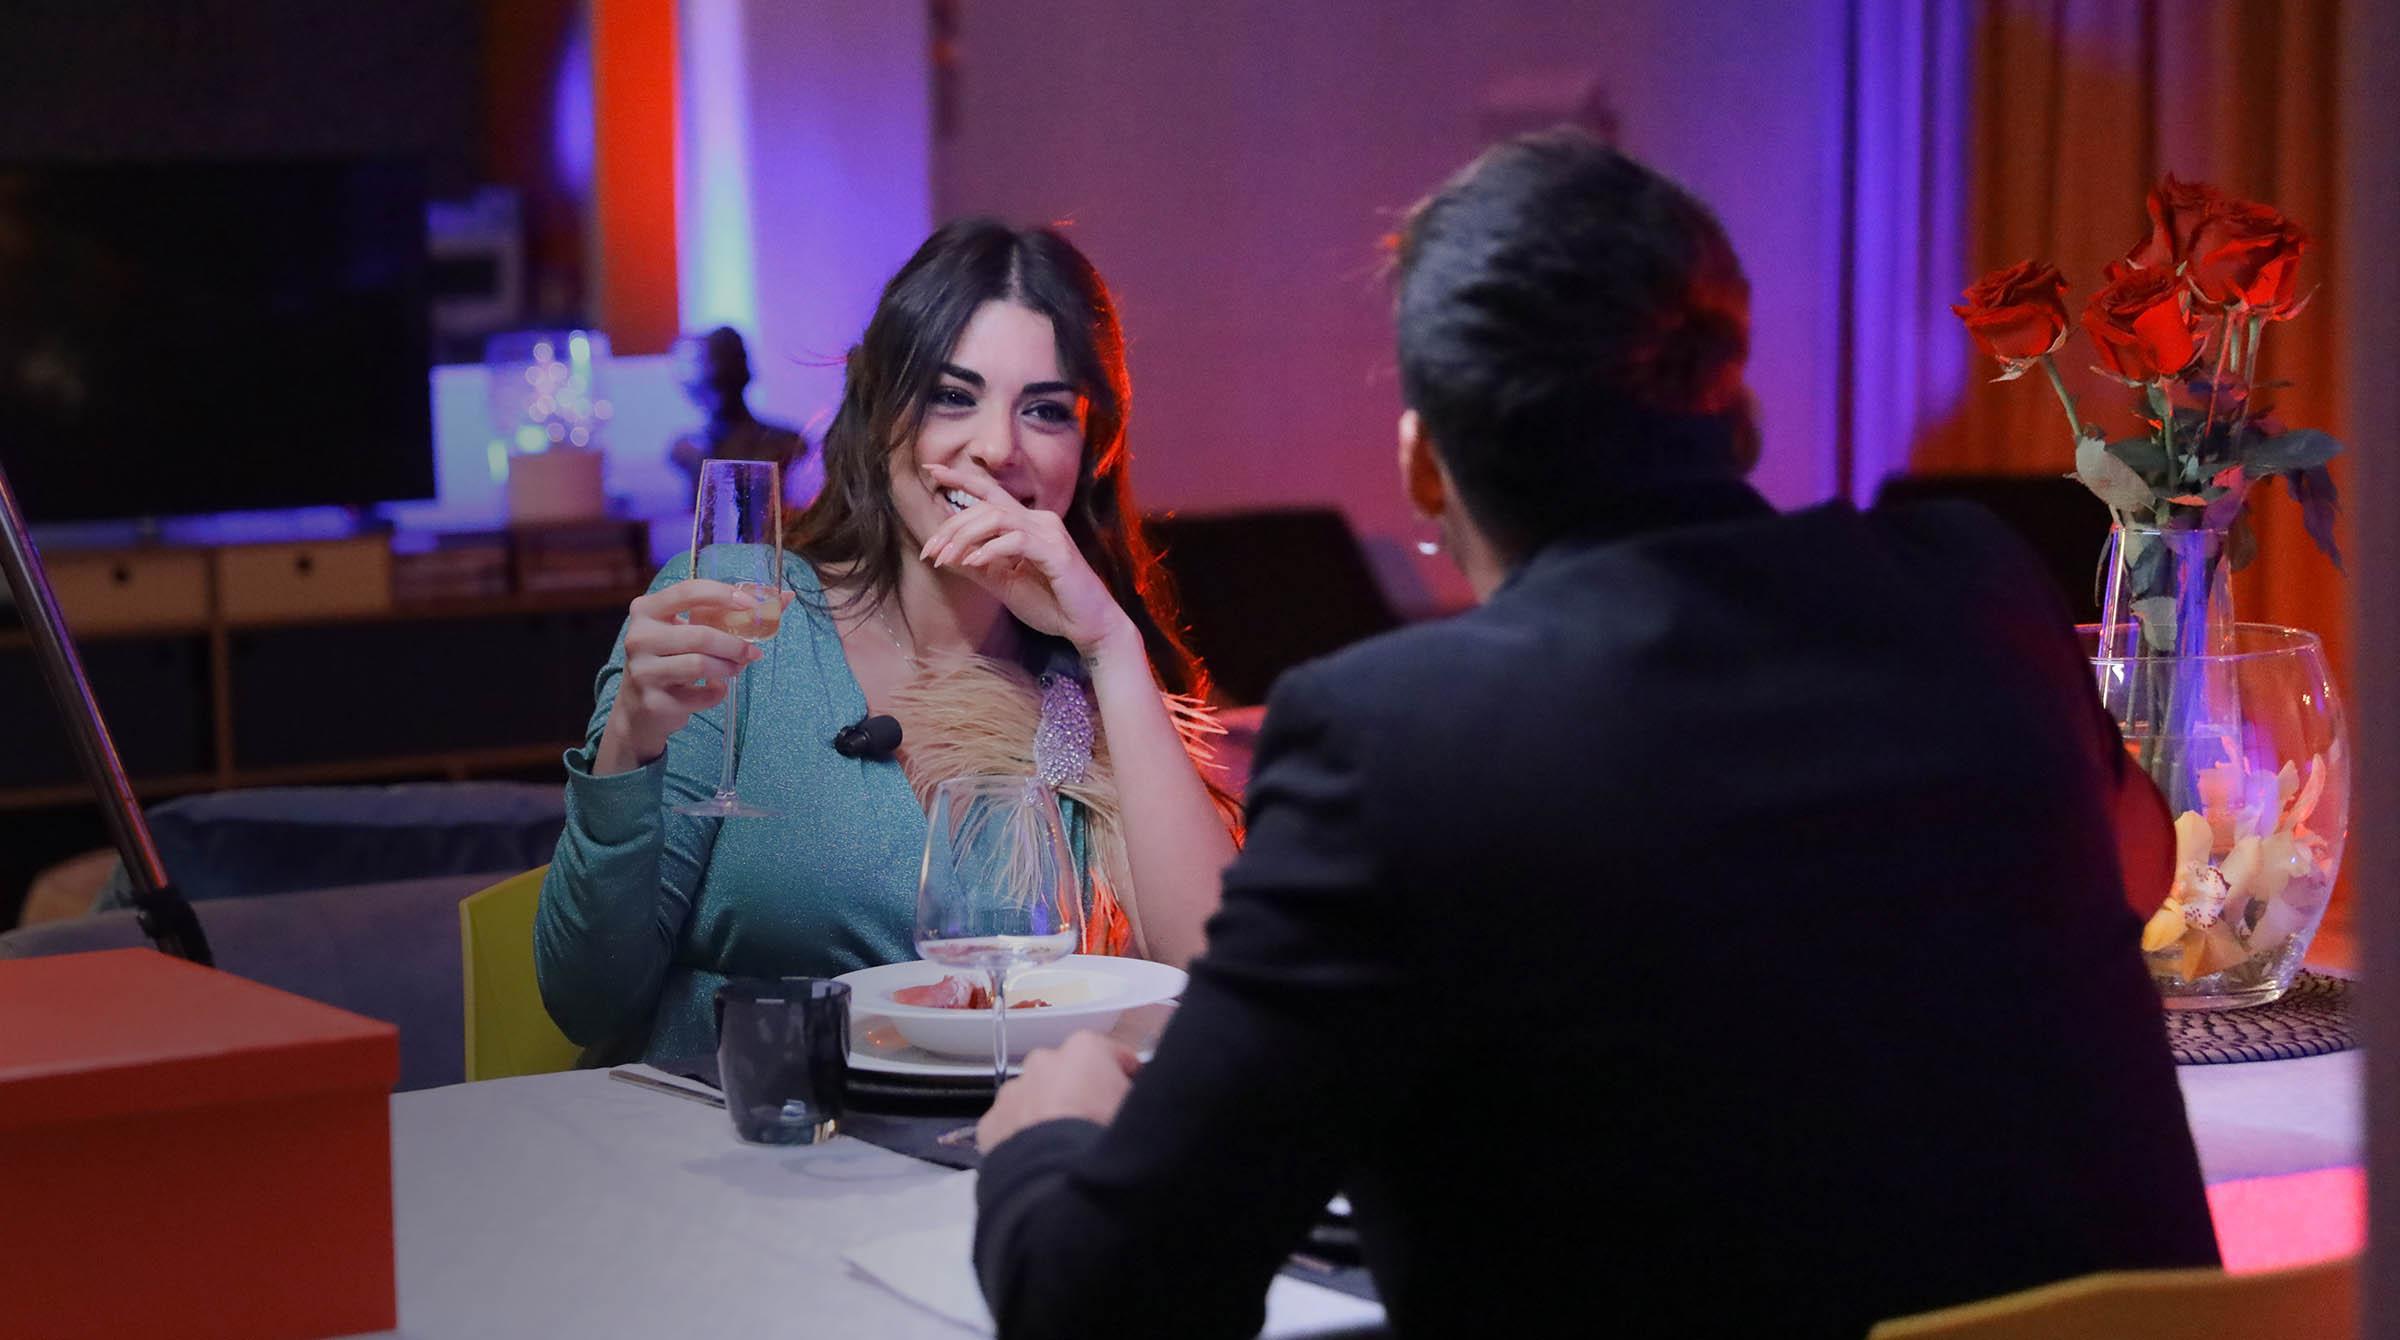 uominiedonne-cena-giulioegiulia